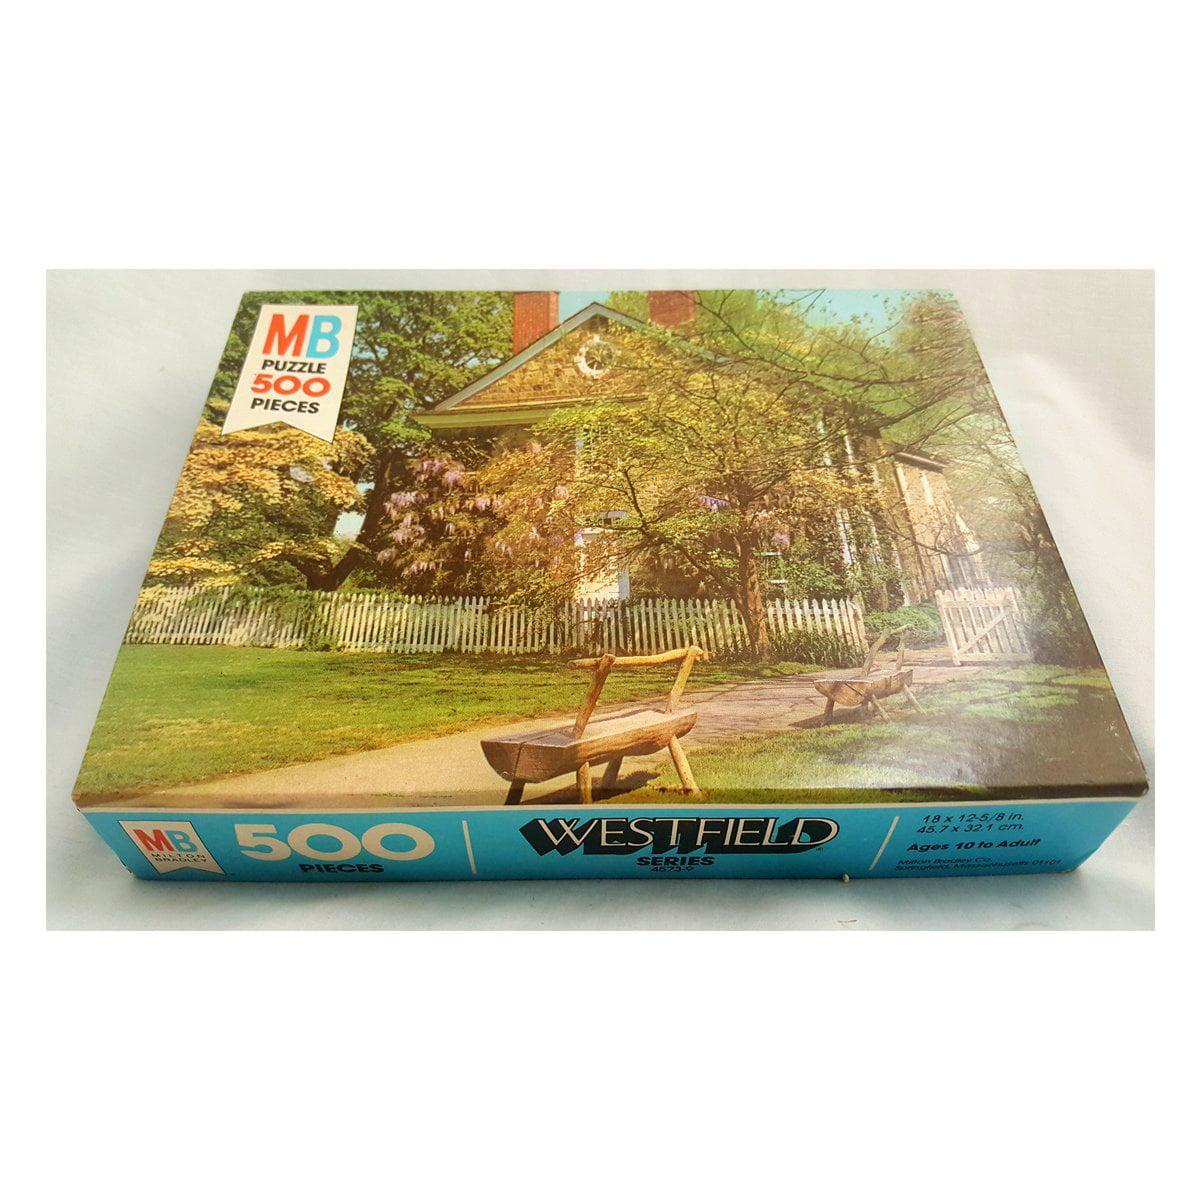 Vintage 1979 Milton Bradley Westfield Series Jigsaw Puzzle 500 Piece No. 4573-9 by Milton Bradley Co